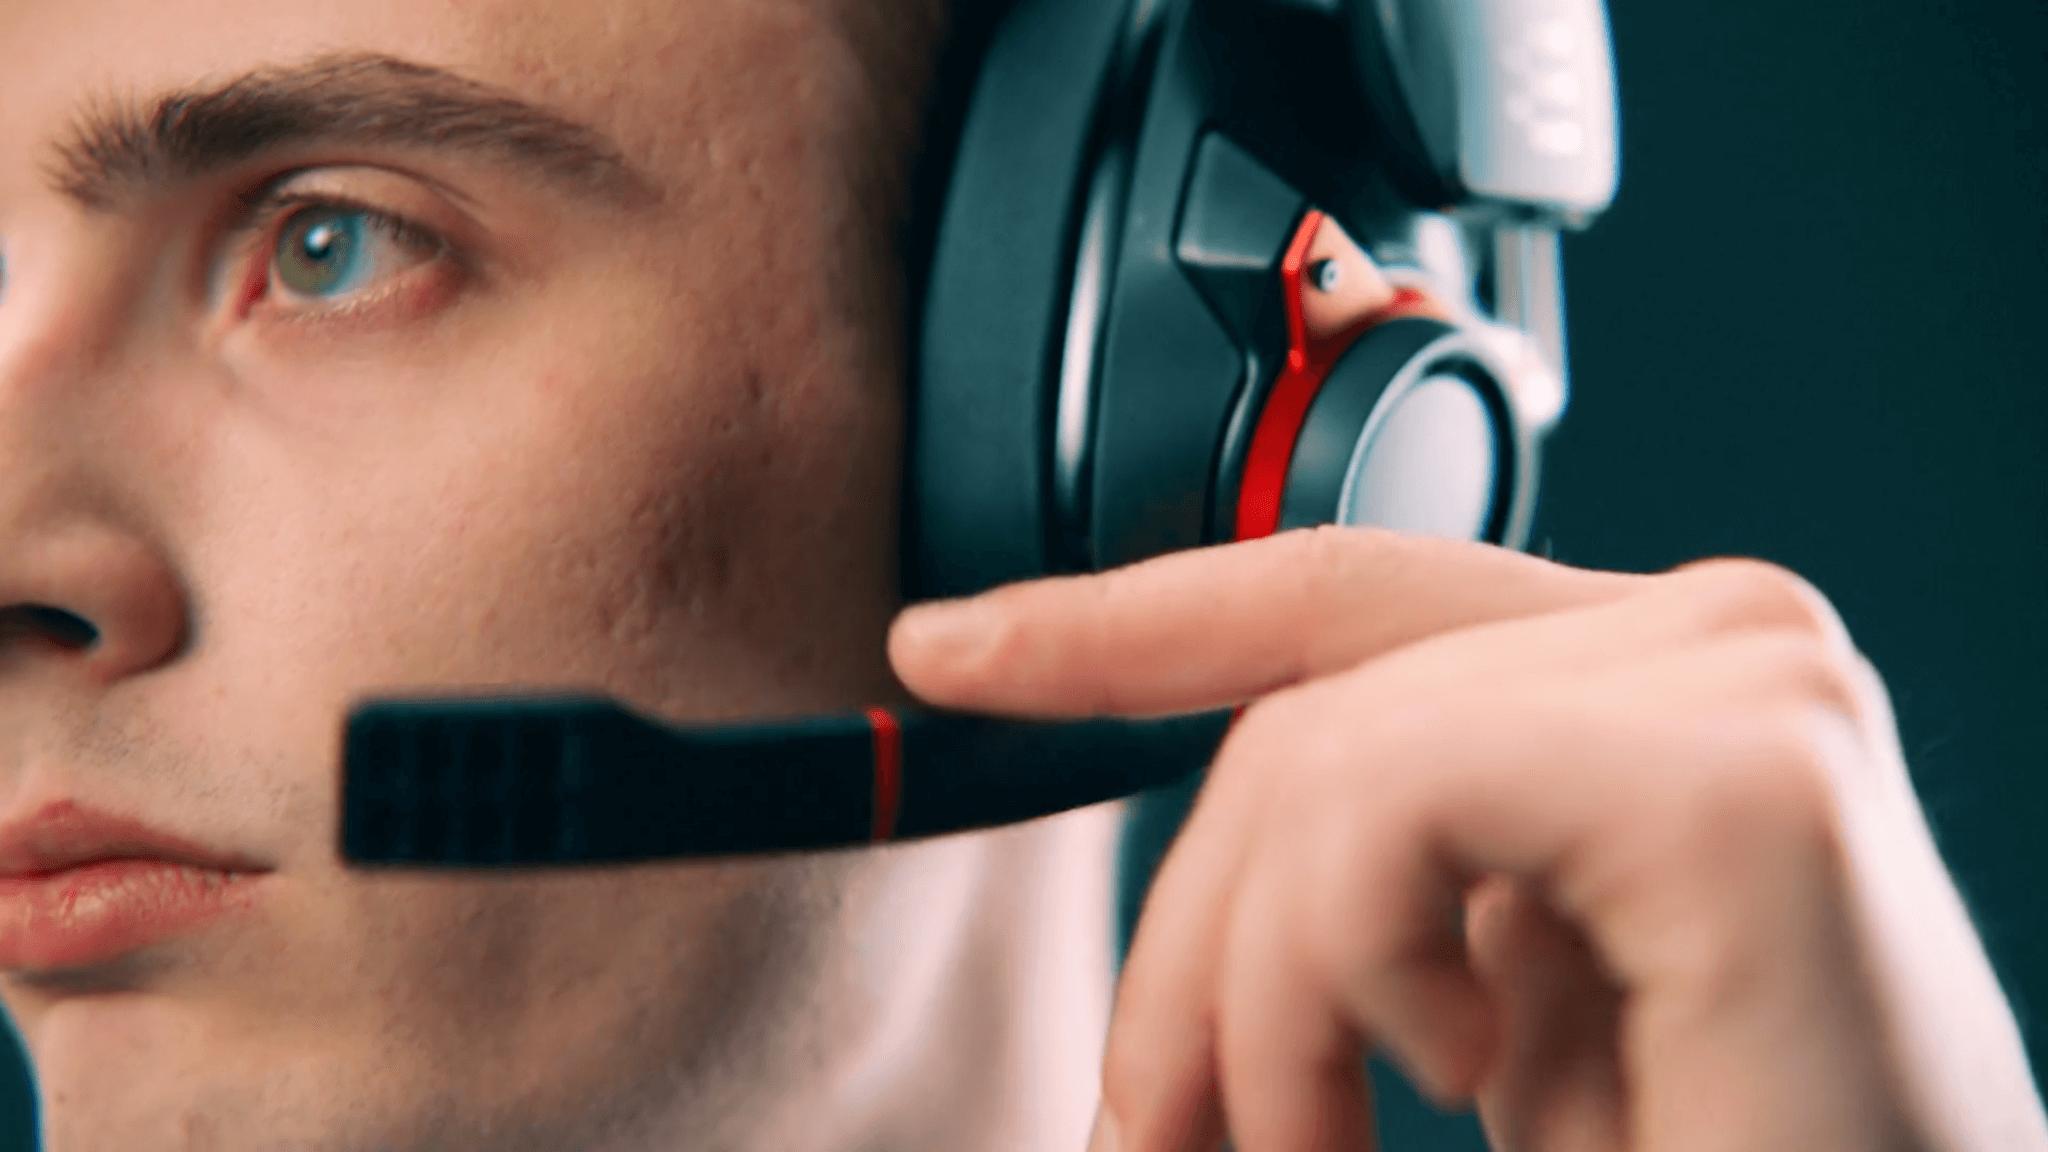 epos-gsp-601-gaming-headset